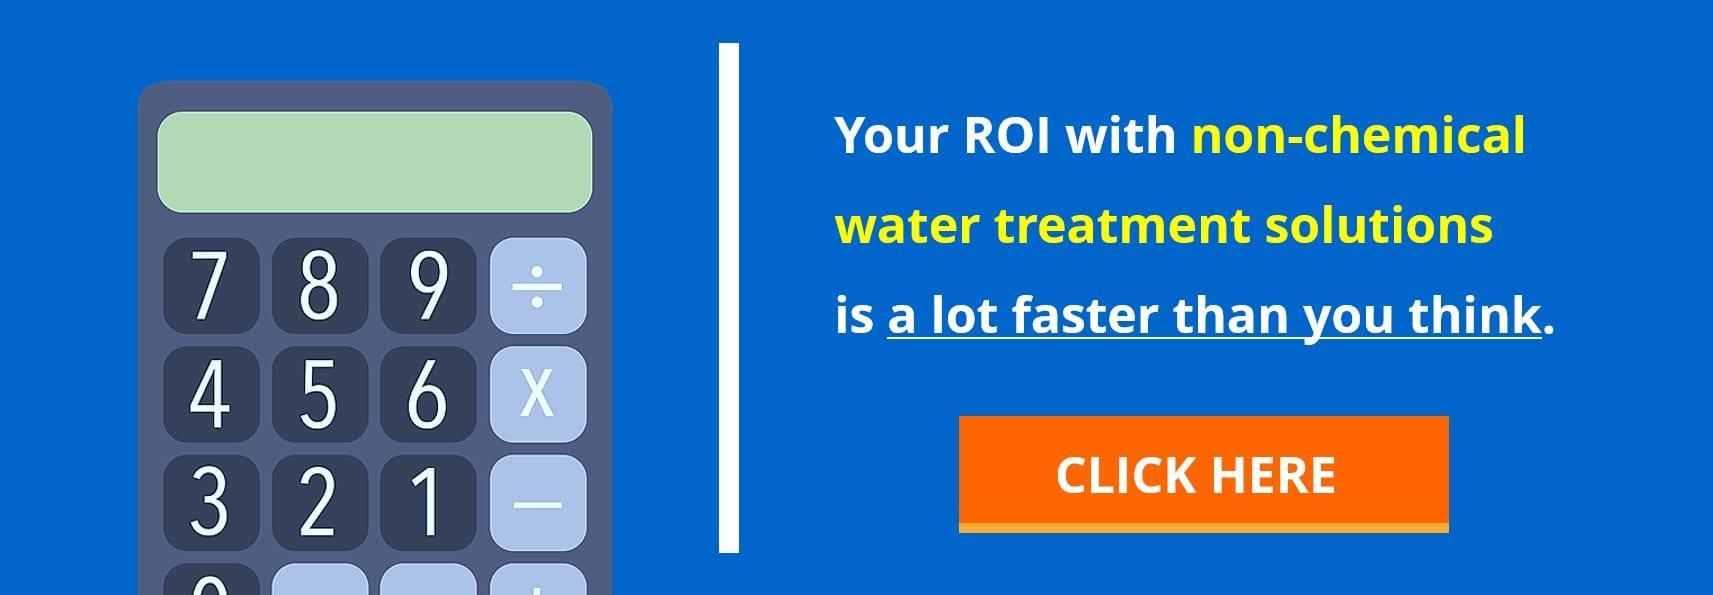 HVAC non chemical water treatment ROI